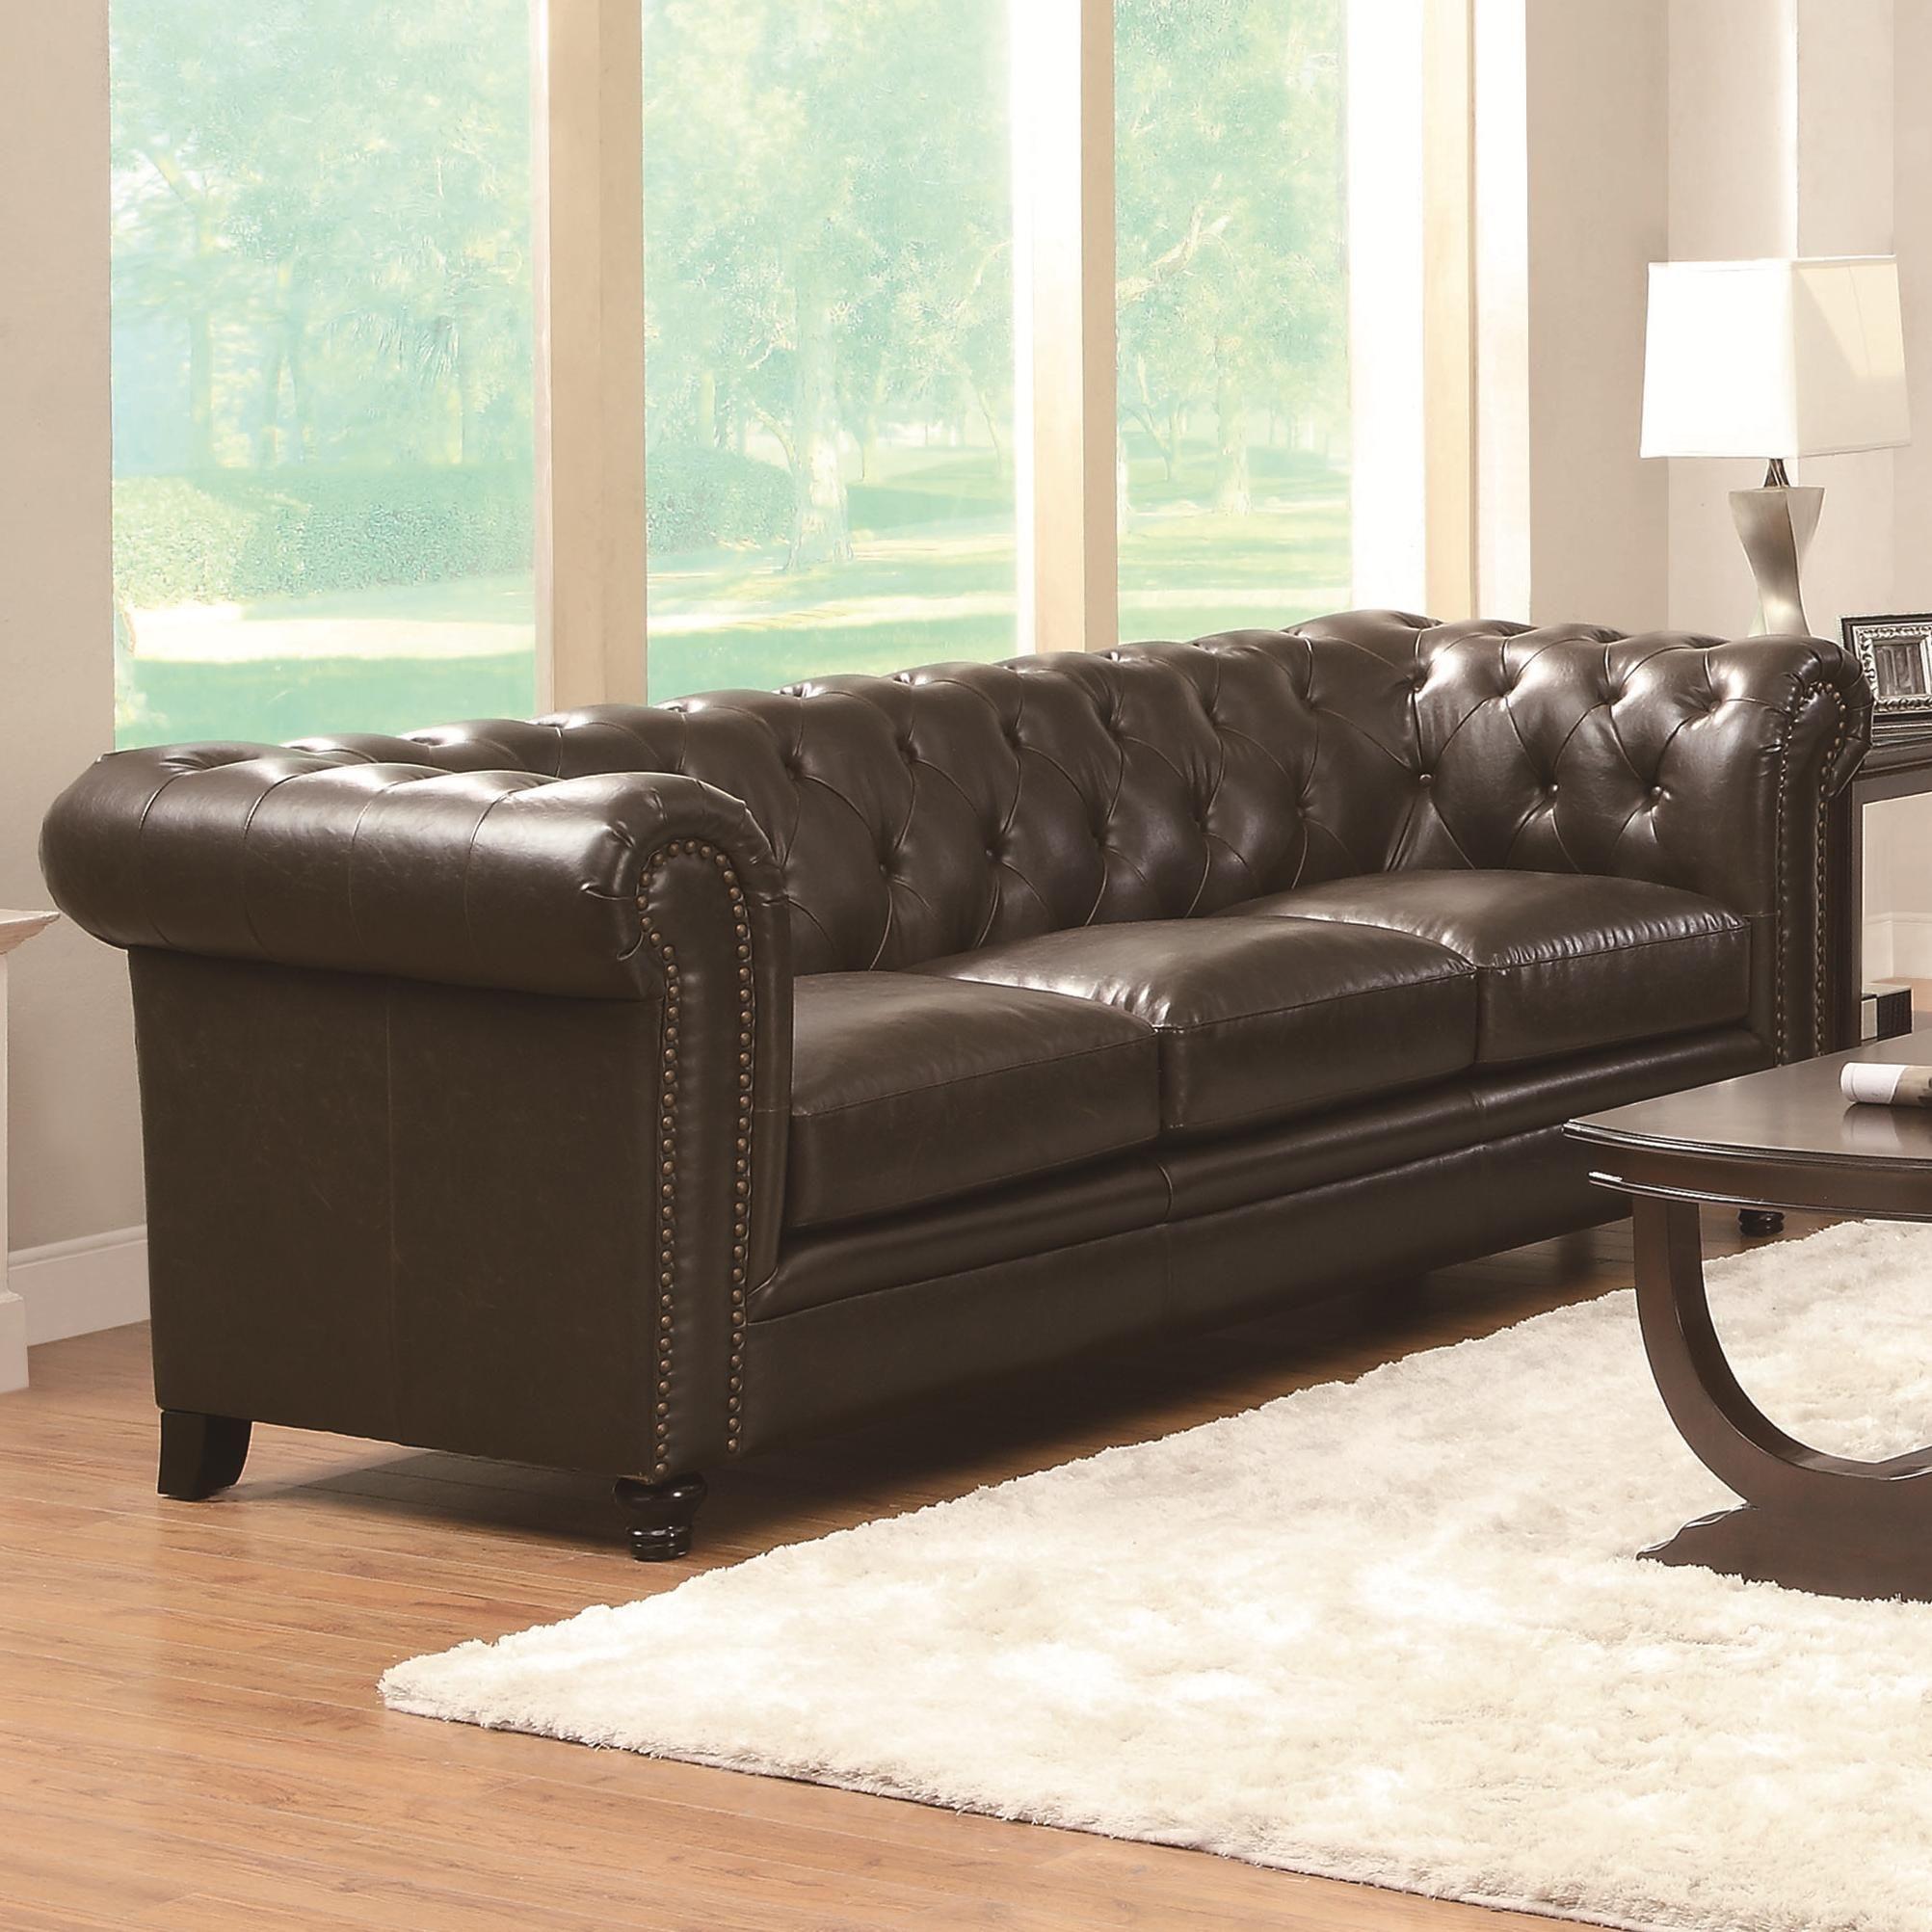 schlafsofa mit ecke top smart schlafsofa anita with. Black Bedroom Furniture Sets. Home Design Ideas